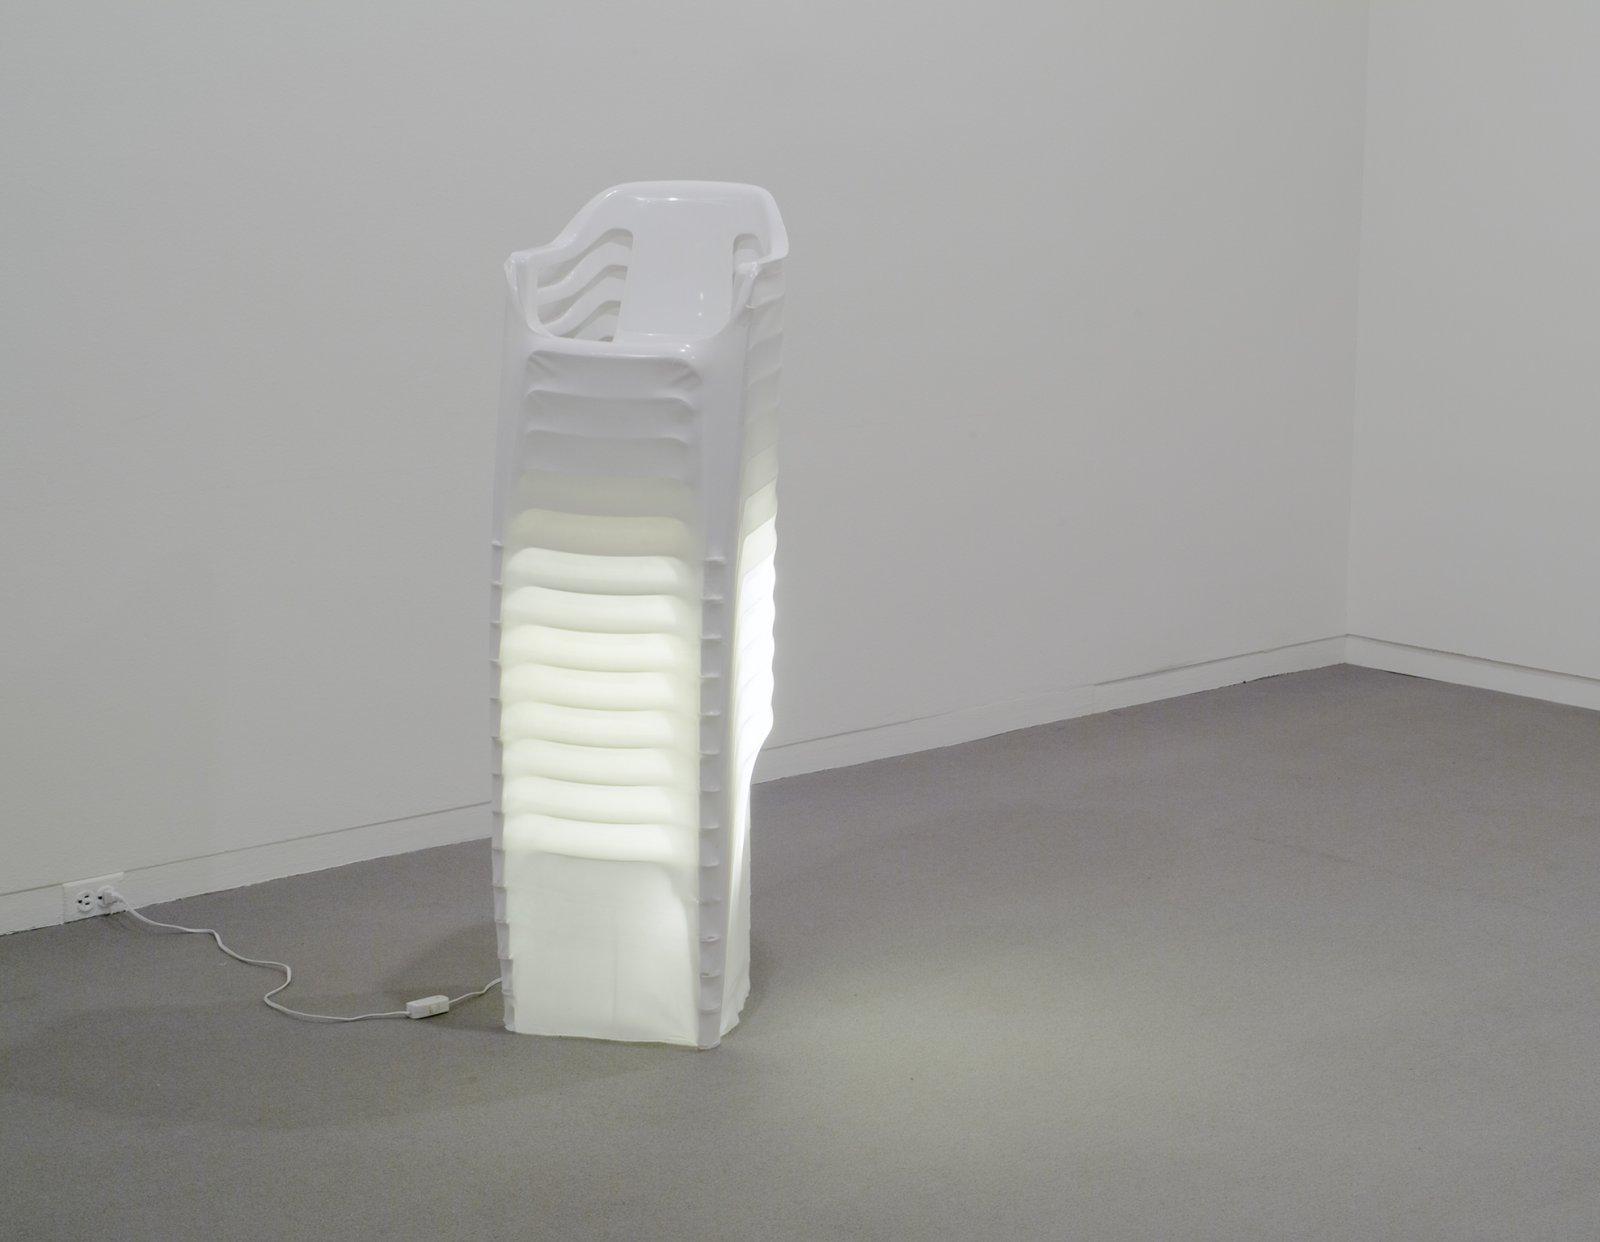 Brian Jungen,Mise en scene, 2000, plastic chairs, polyethylene, fluorescent lights, 51 x 15 x 14 in. (128 x 38 x 34 cm)